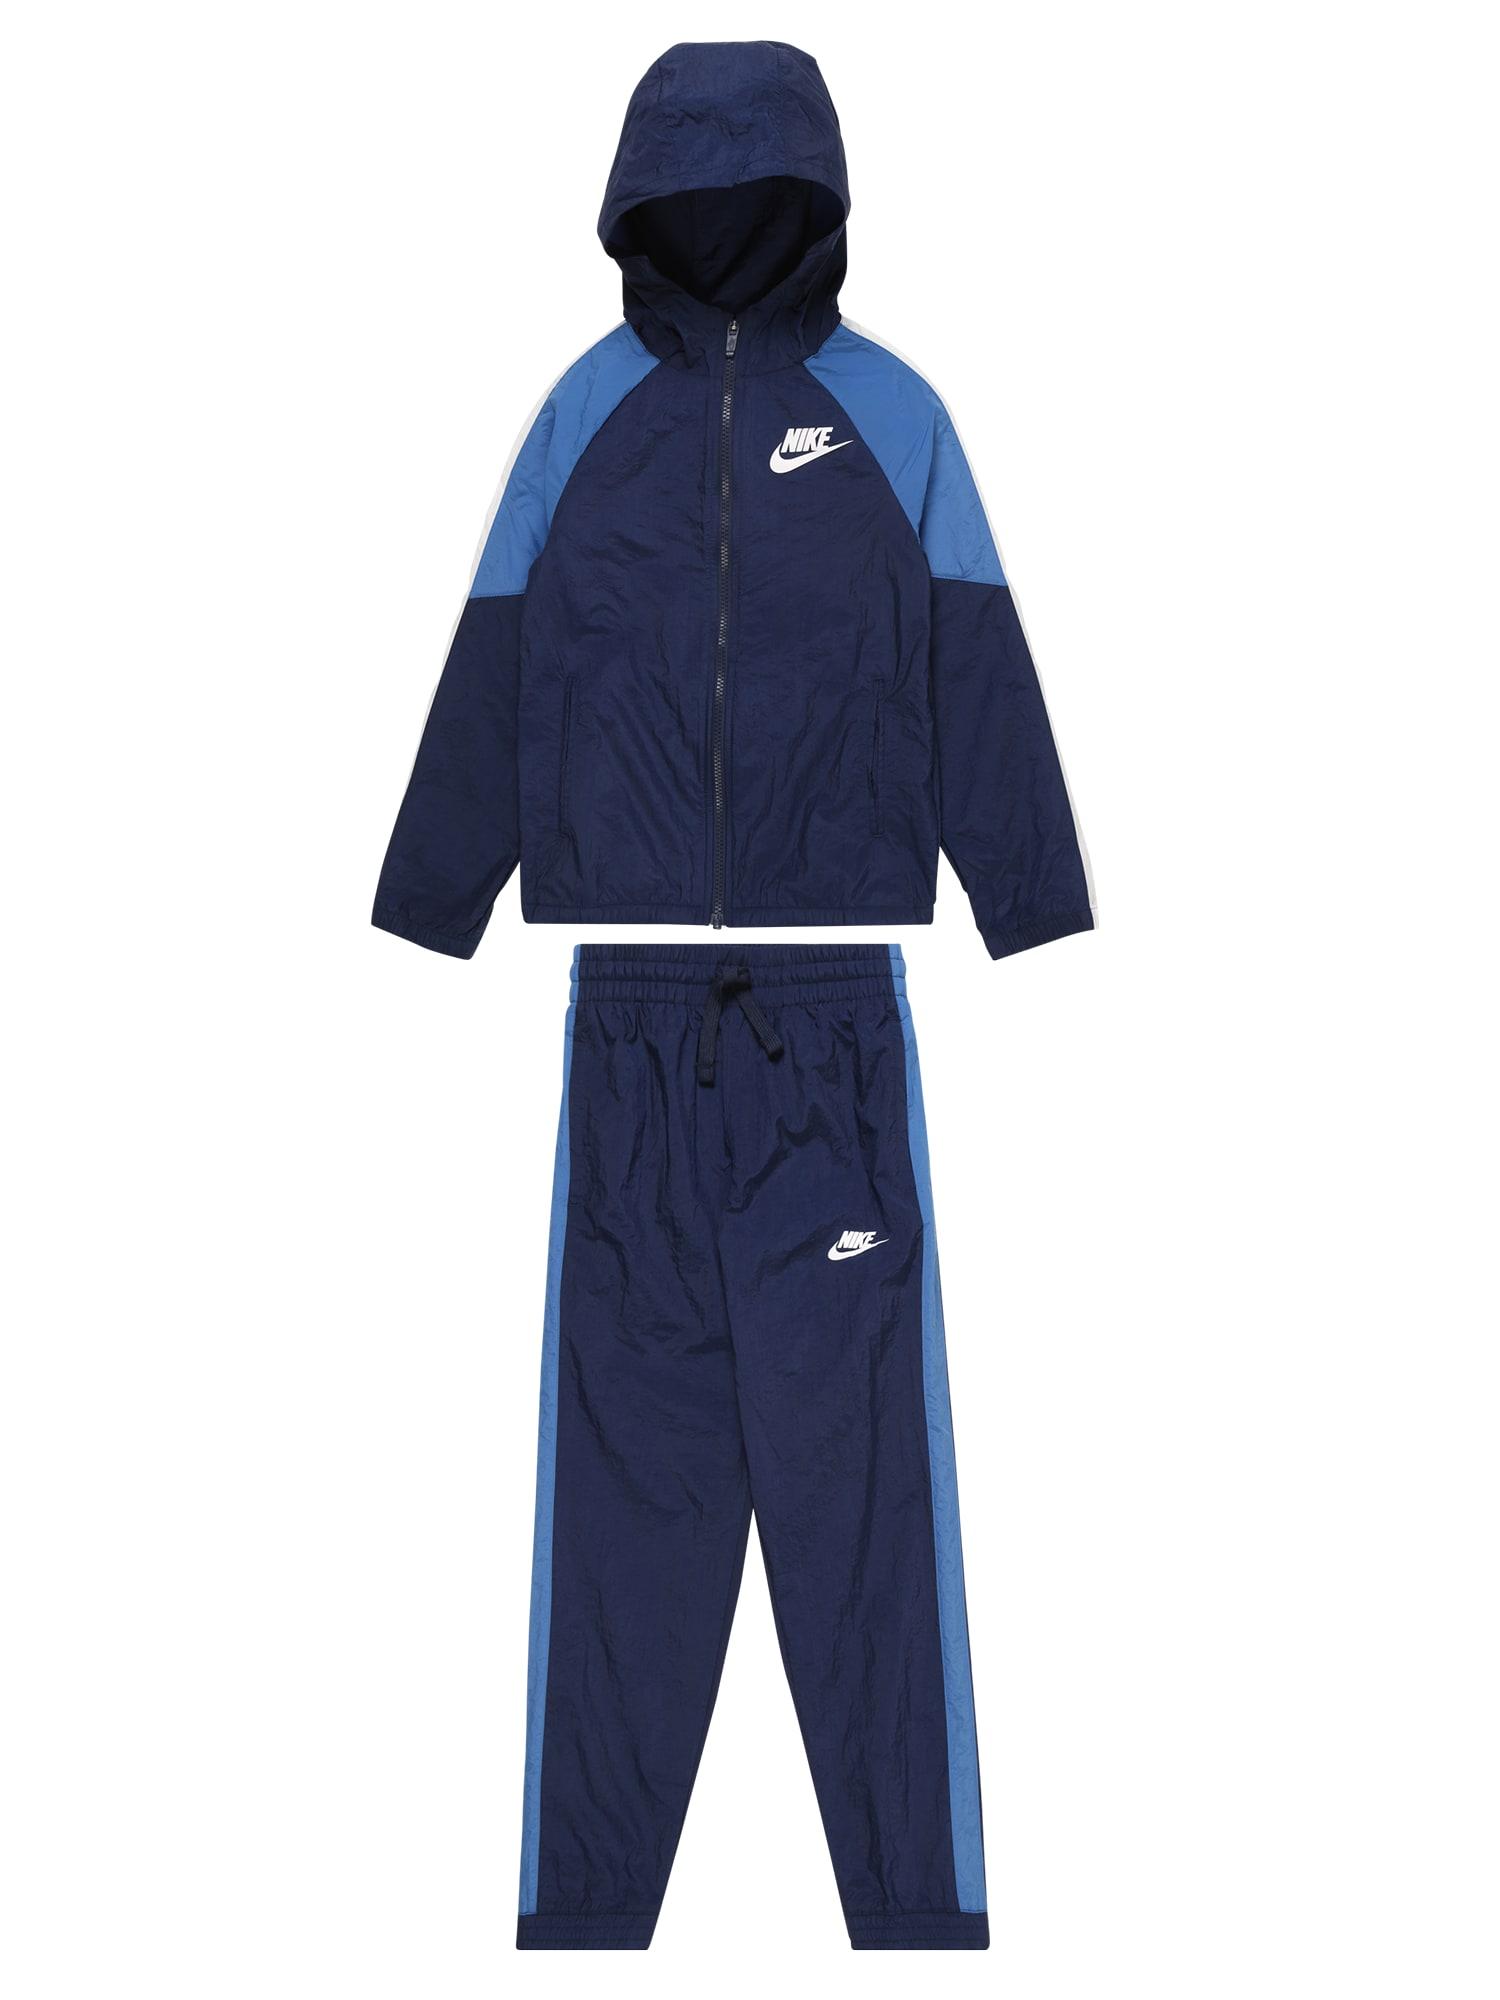 Nike Sportswear Kostiumas šviesiai mėlyna / tamsiai mėlyna